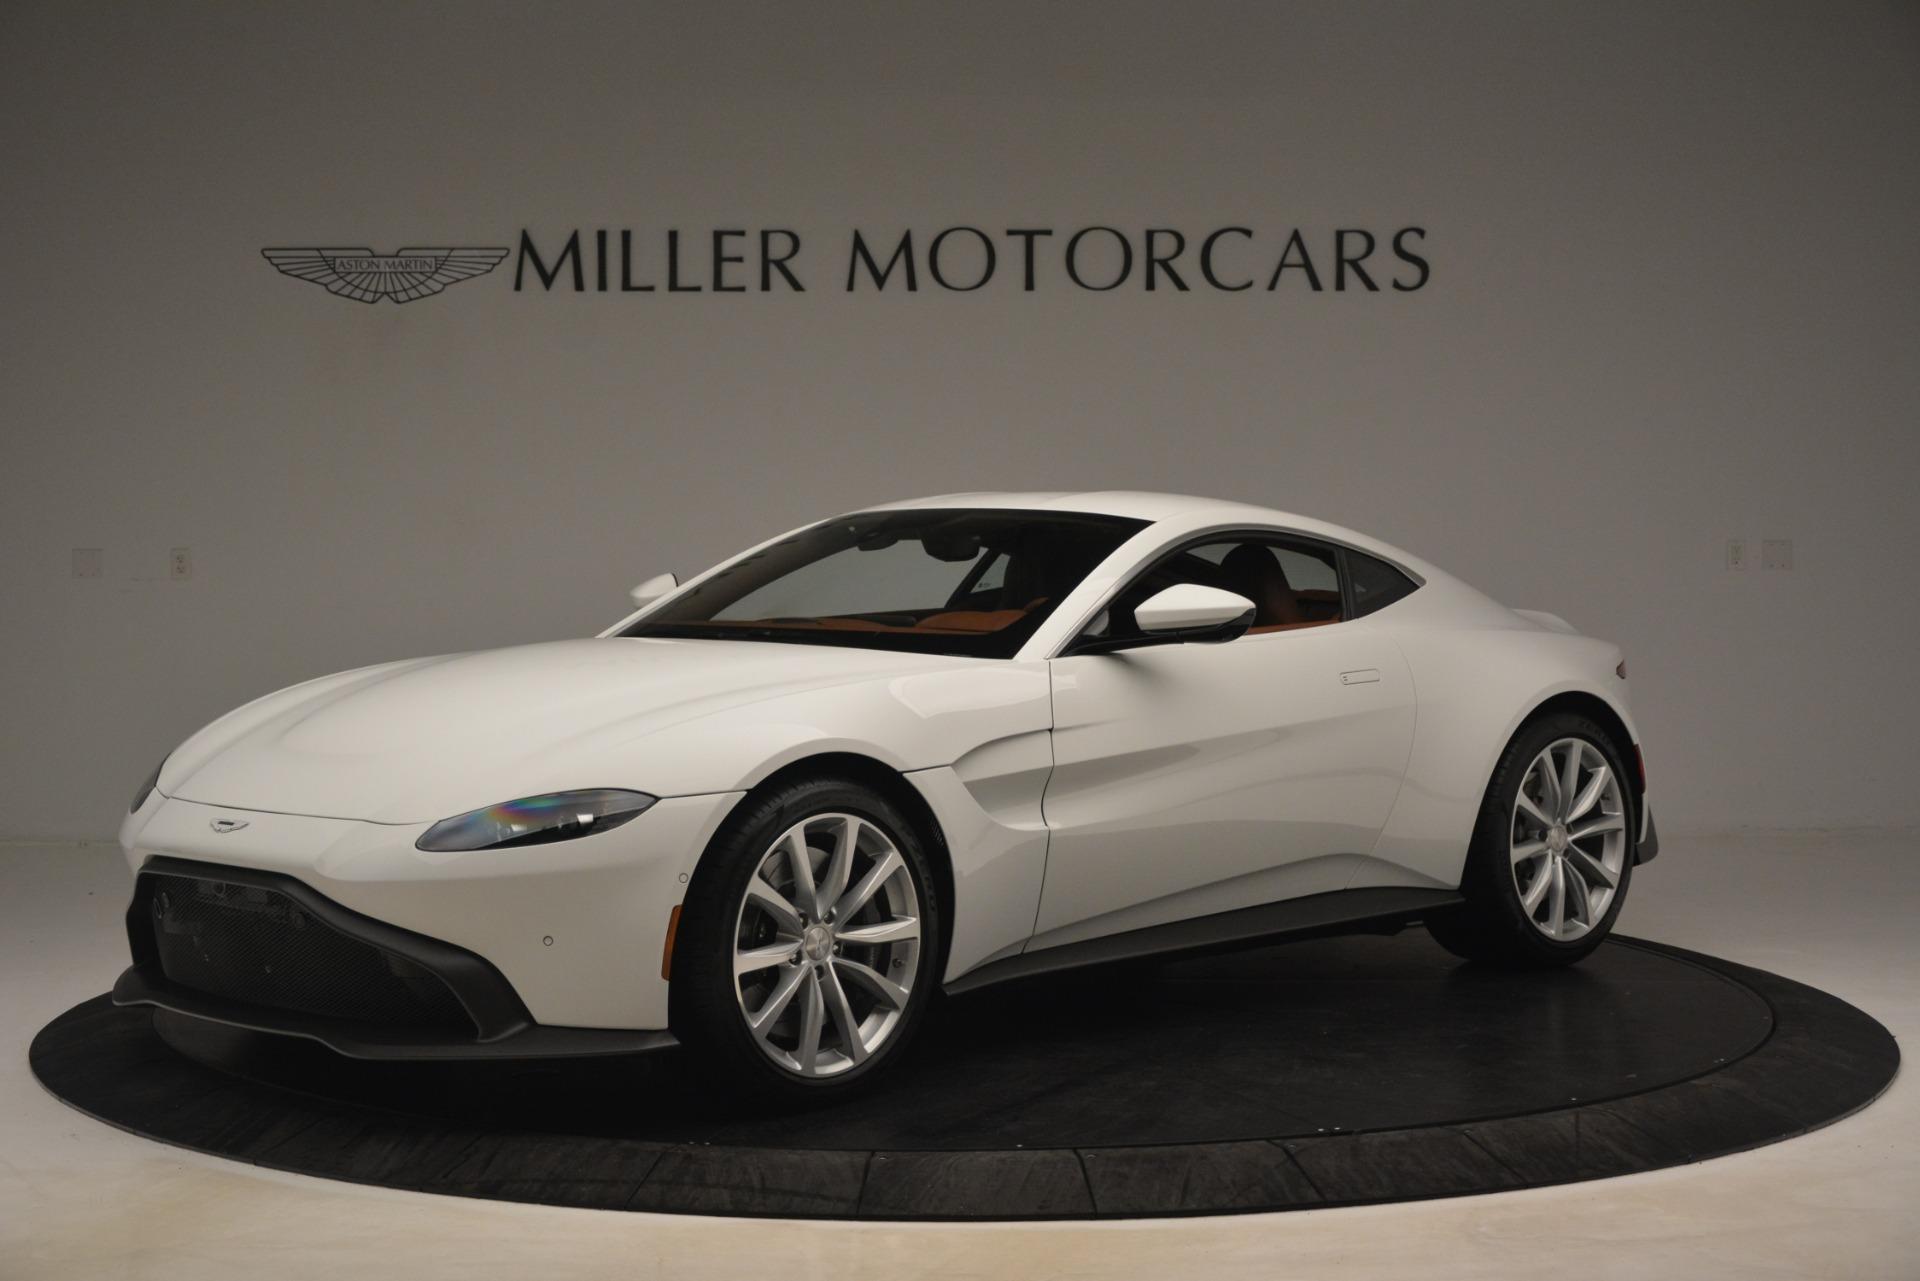 New 2019 Aston Martin Vantage Coupe for sale Sold at Bugatti of Greenwich in Greenwich CT 06830 1